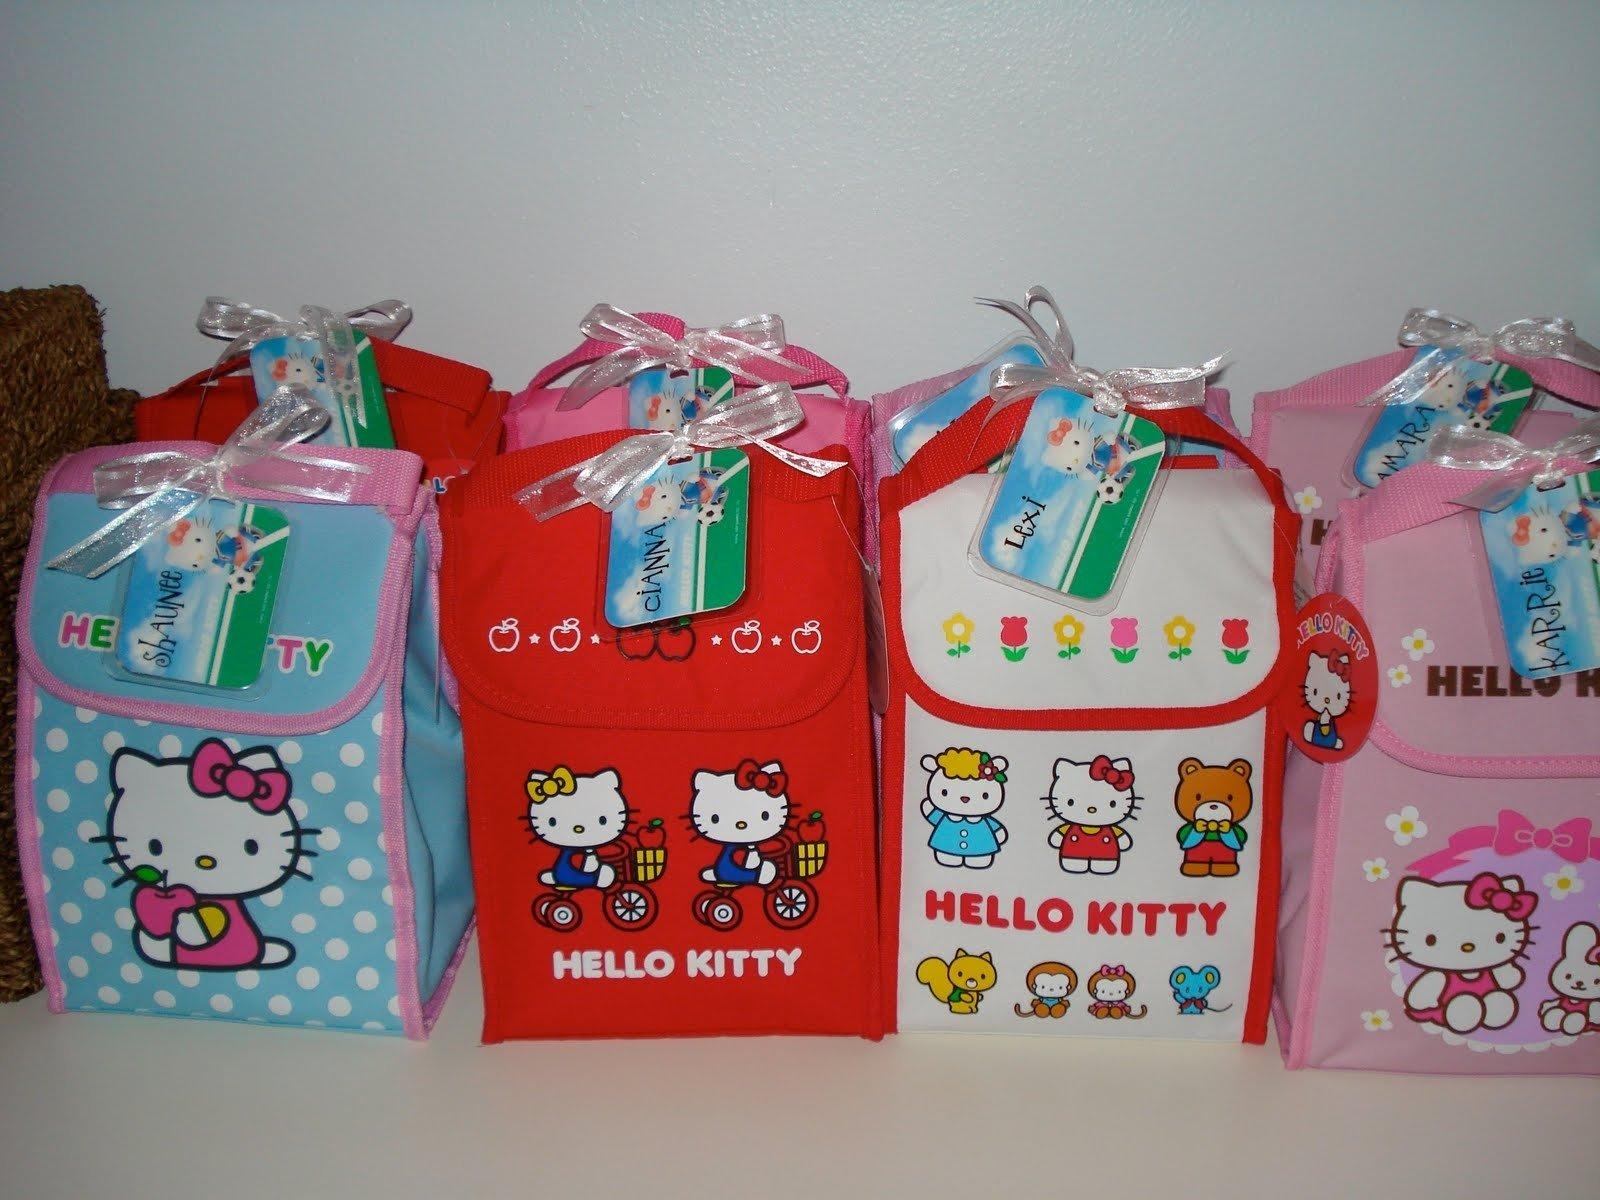 10 Amazing Goodie Bag Ideas For Birthday Party birthday goody bag ideas margusriga baby party cheap birthday 2020